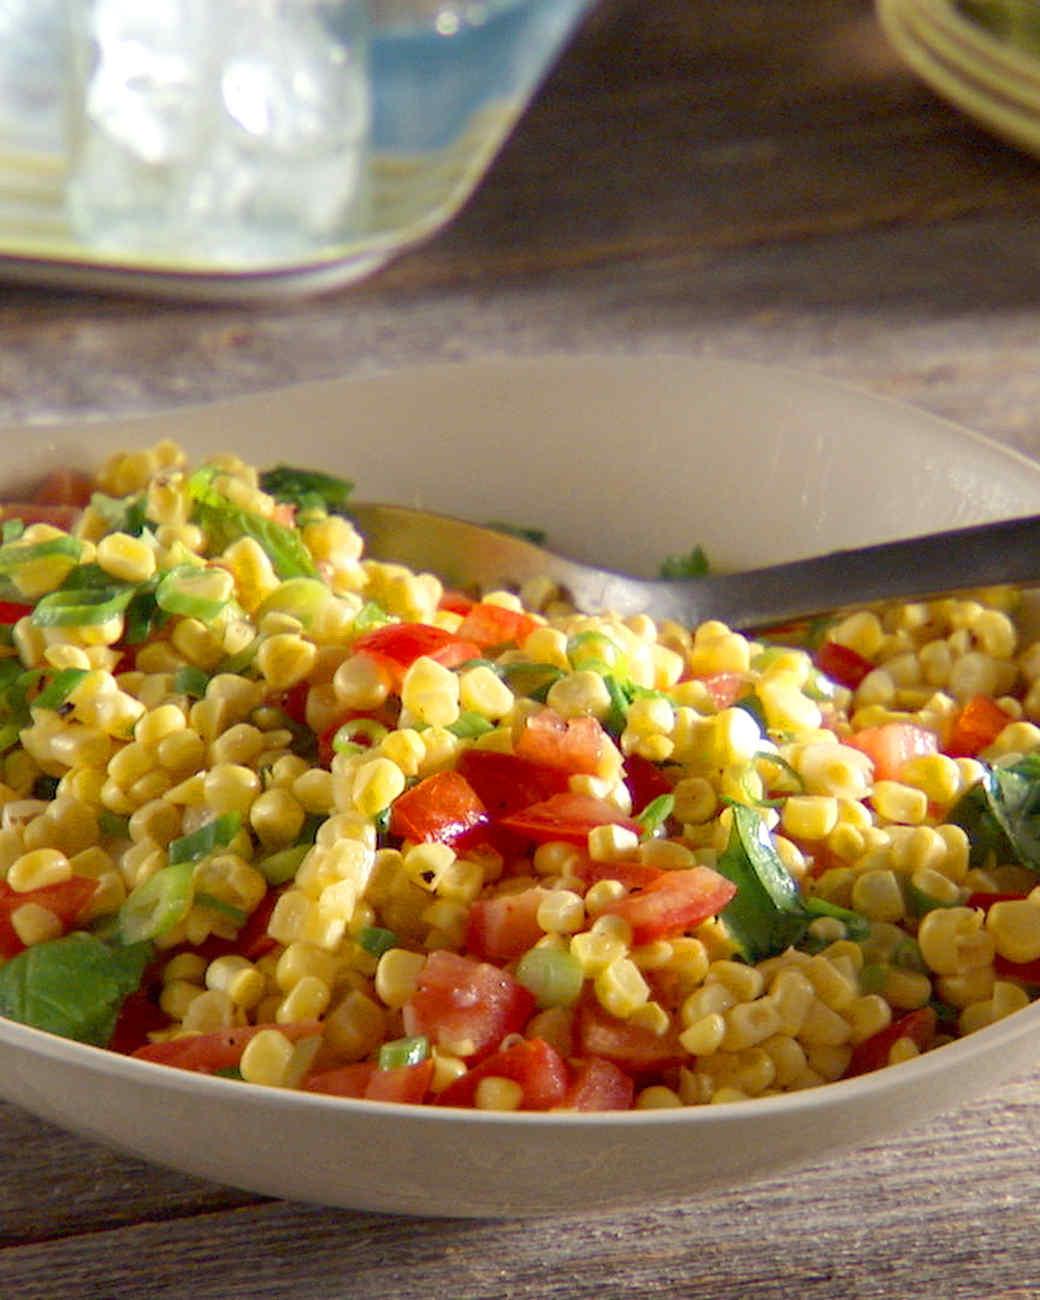 mh_1127_corn_salad.jpg